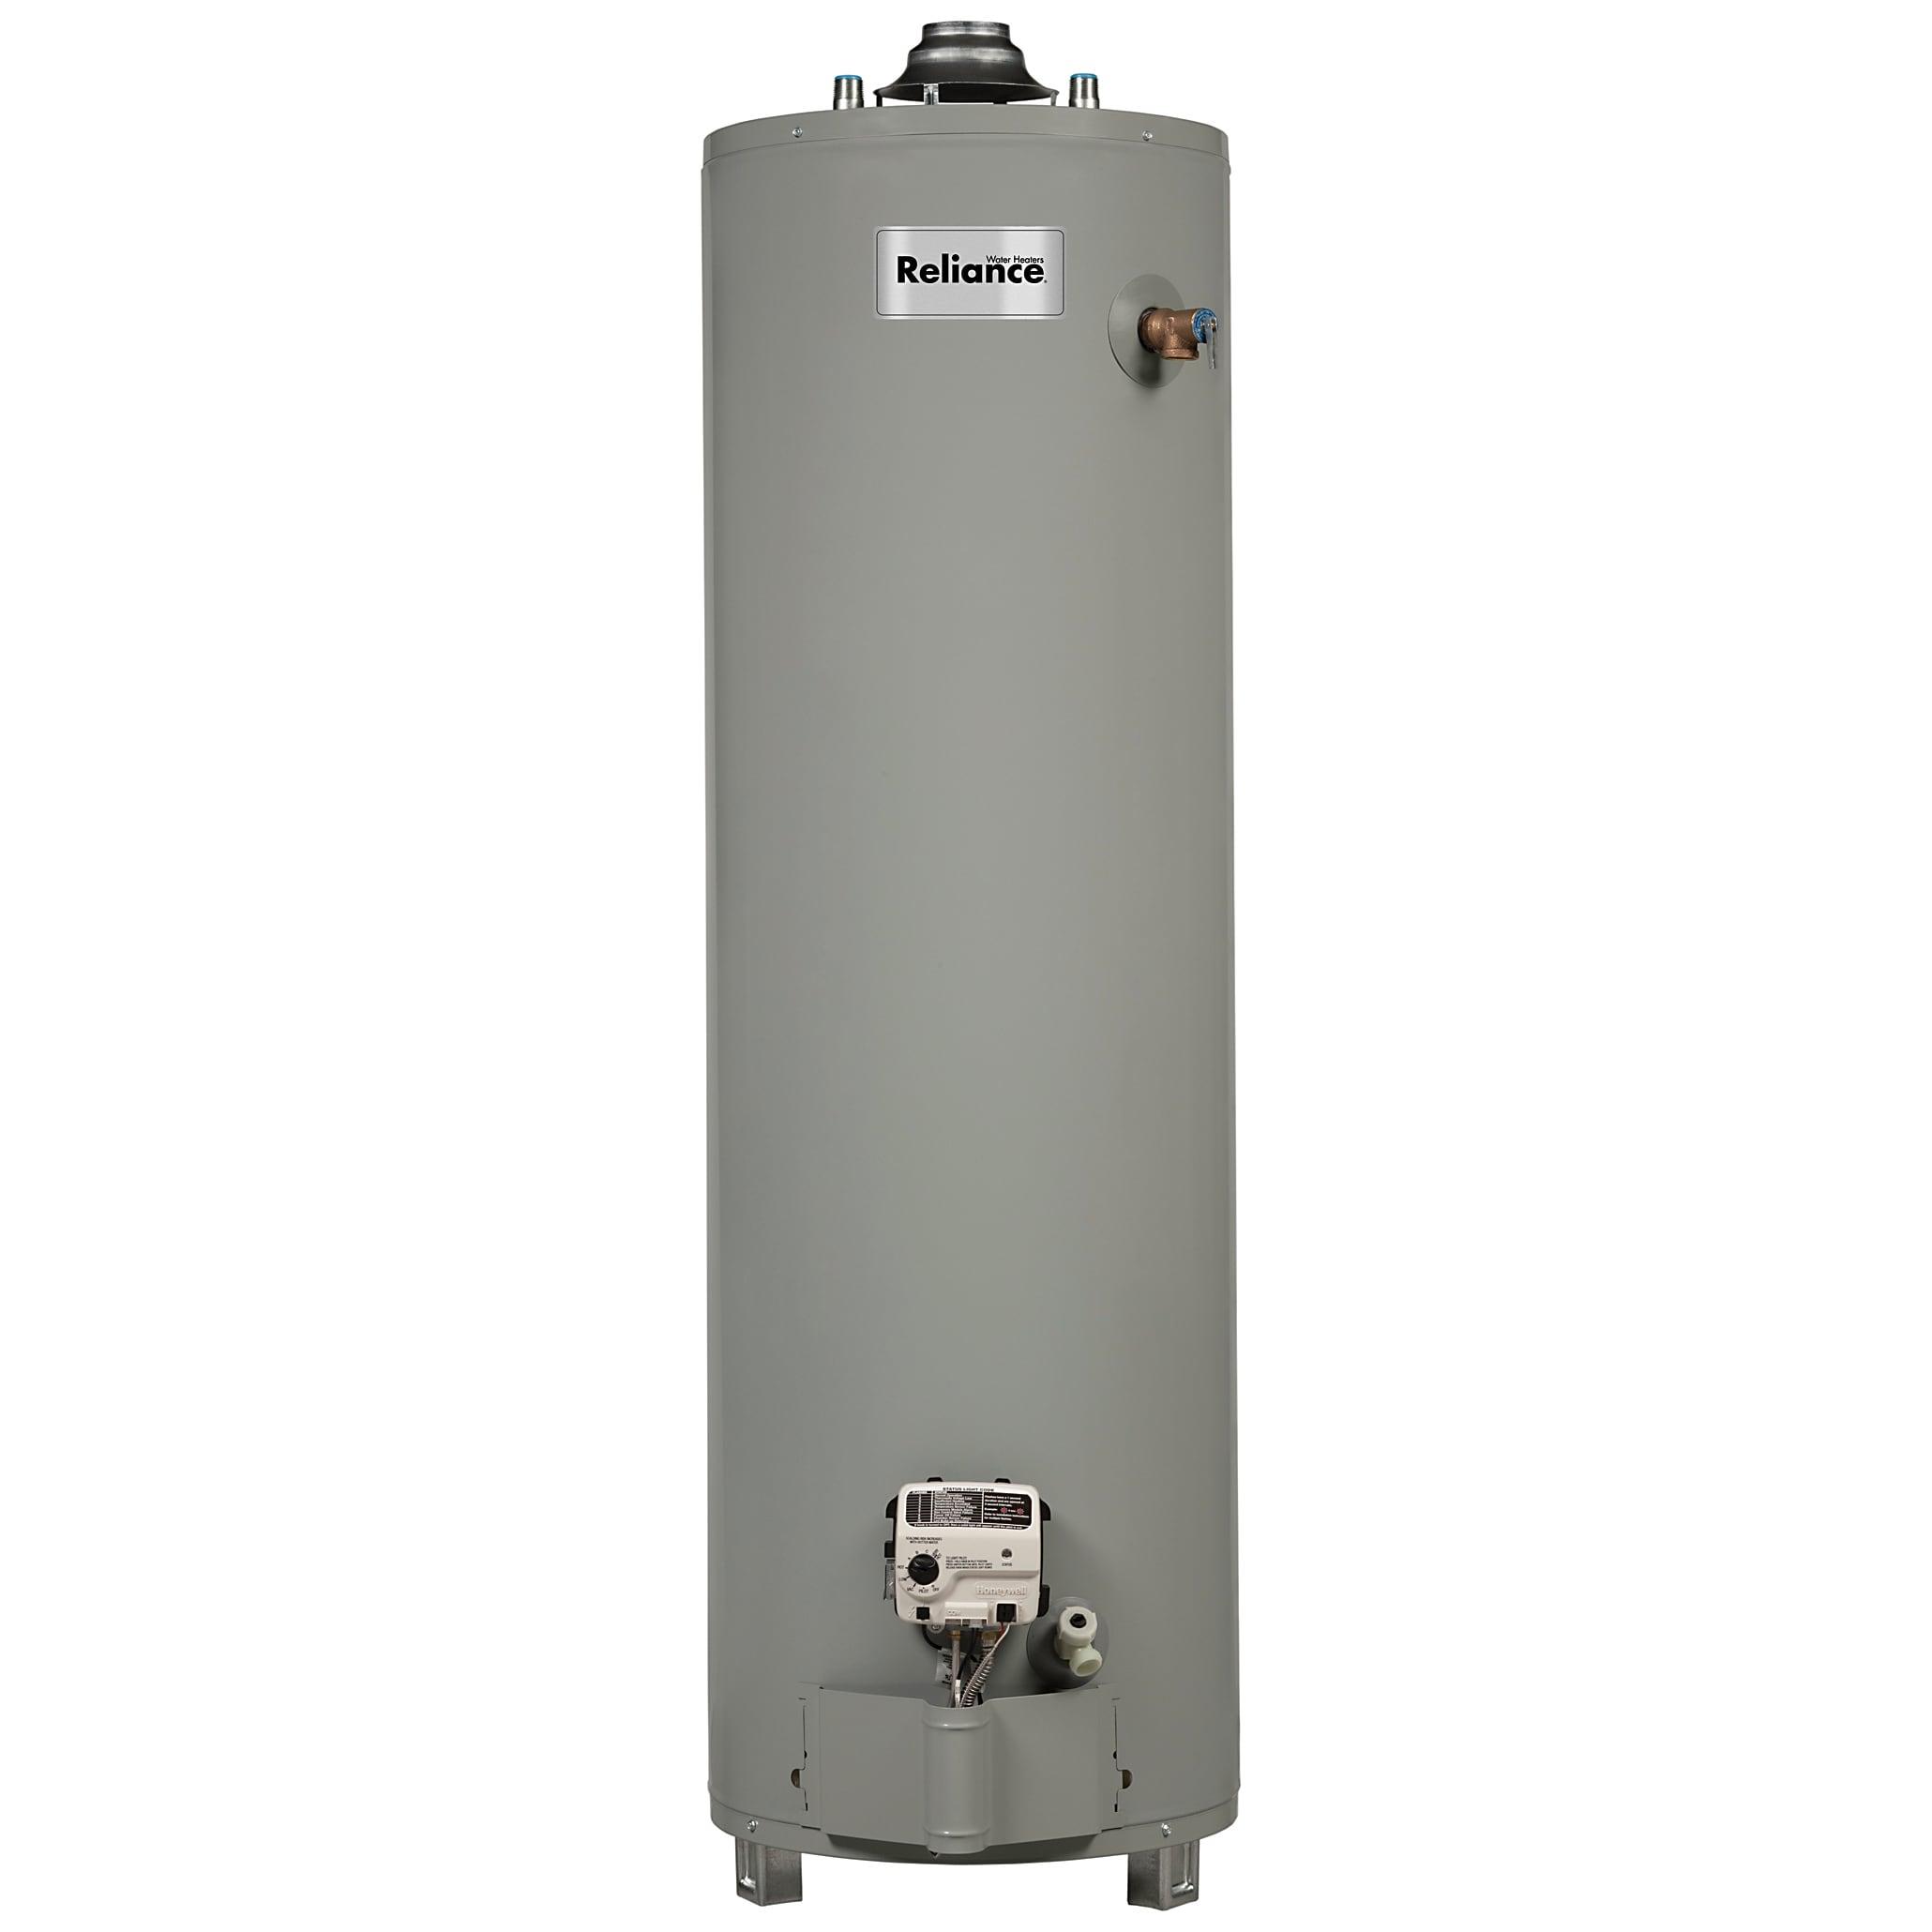 Jensen Reliance 6 30 Unort 30 Gallon Gas Water Heater (Wa...